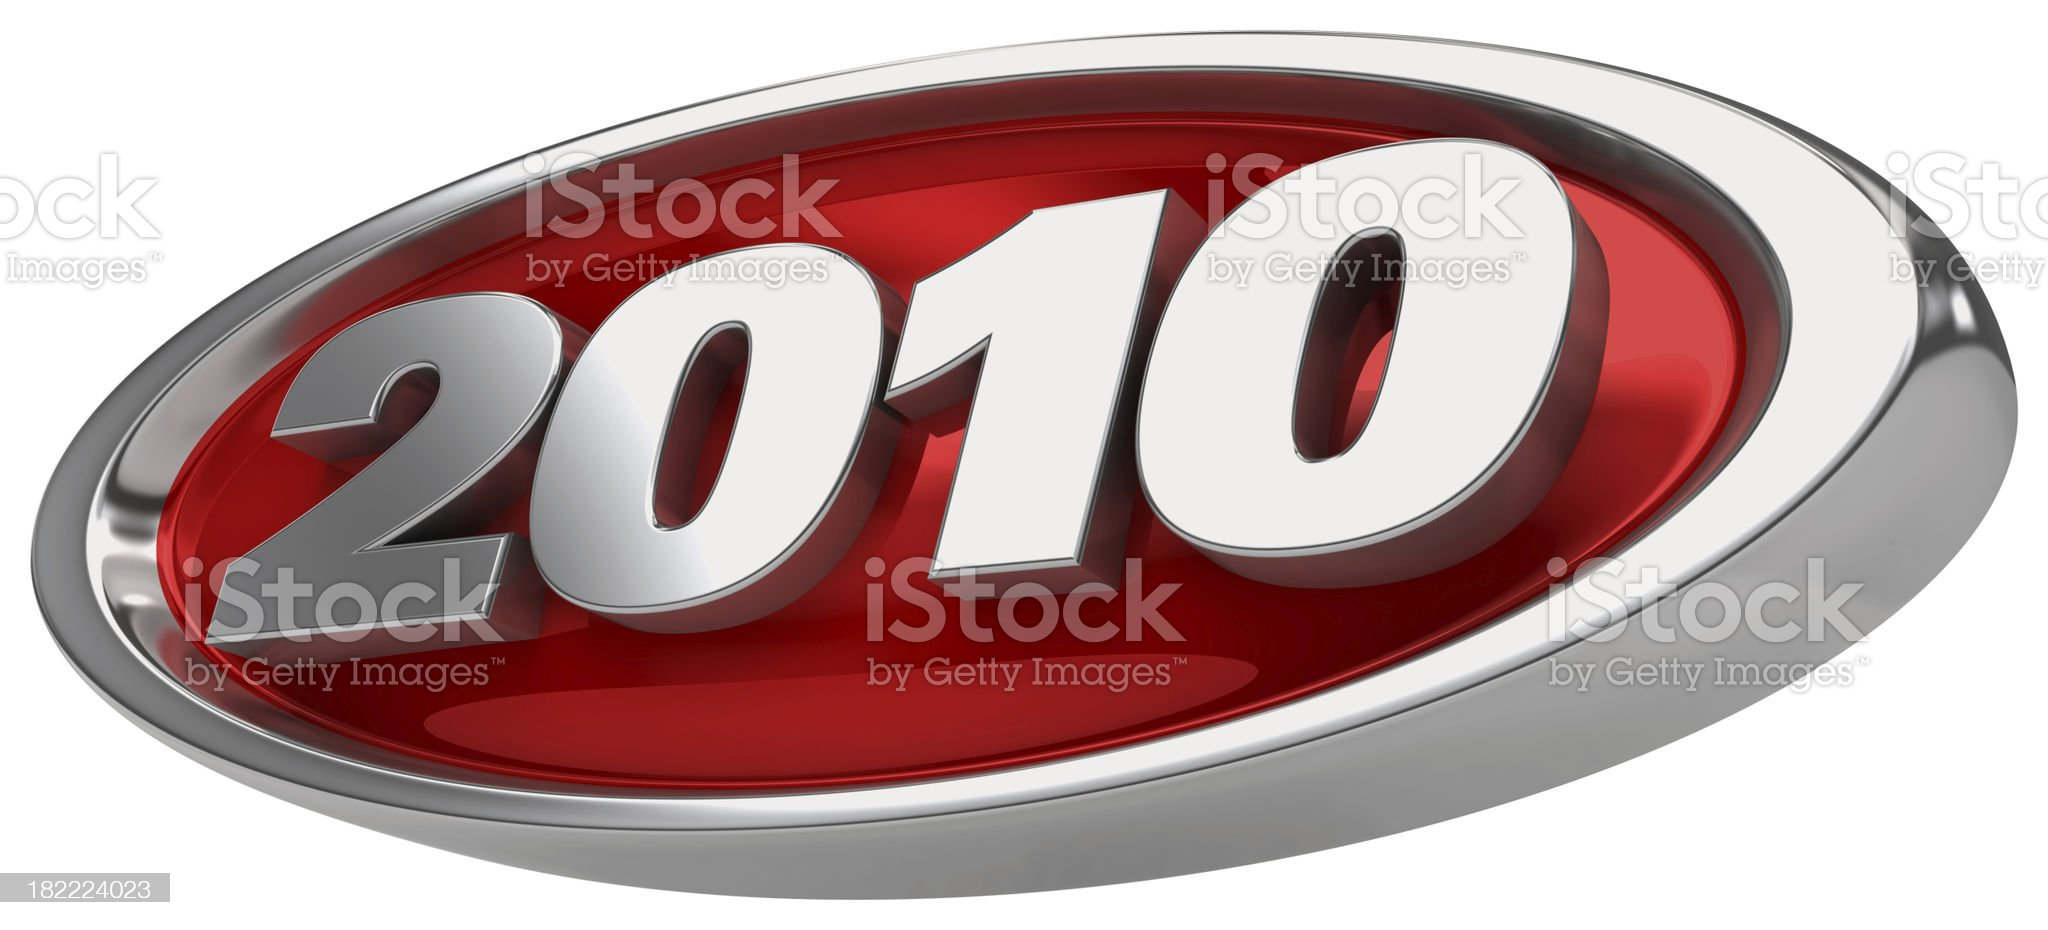 badge 2010 royalty-free stock photo